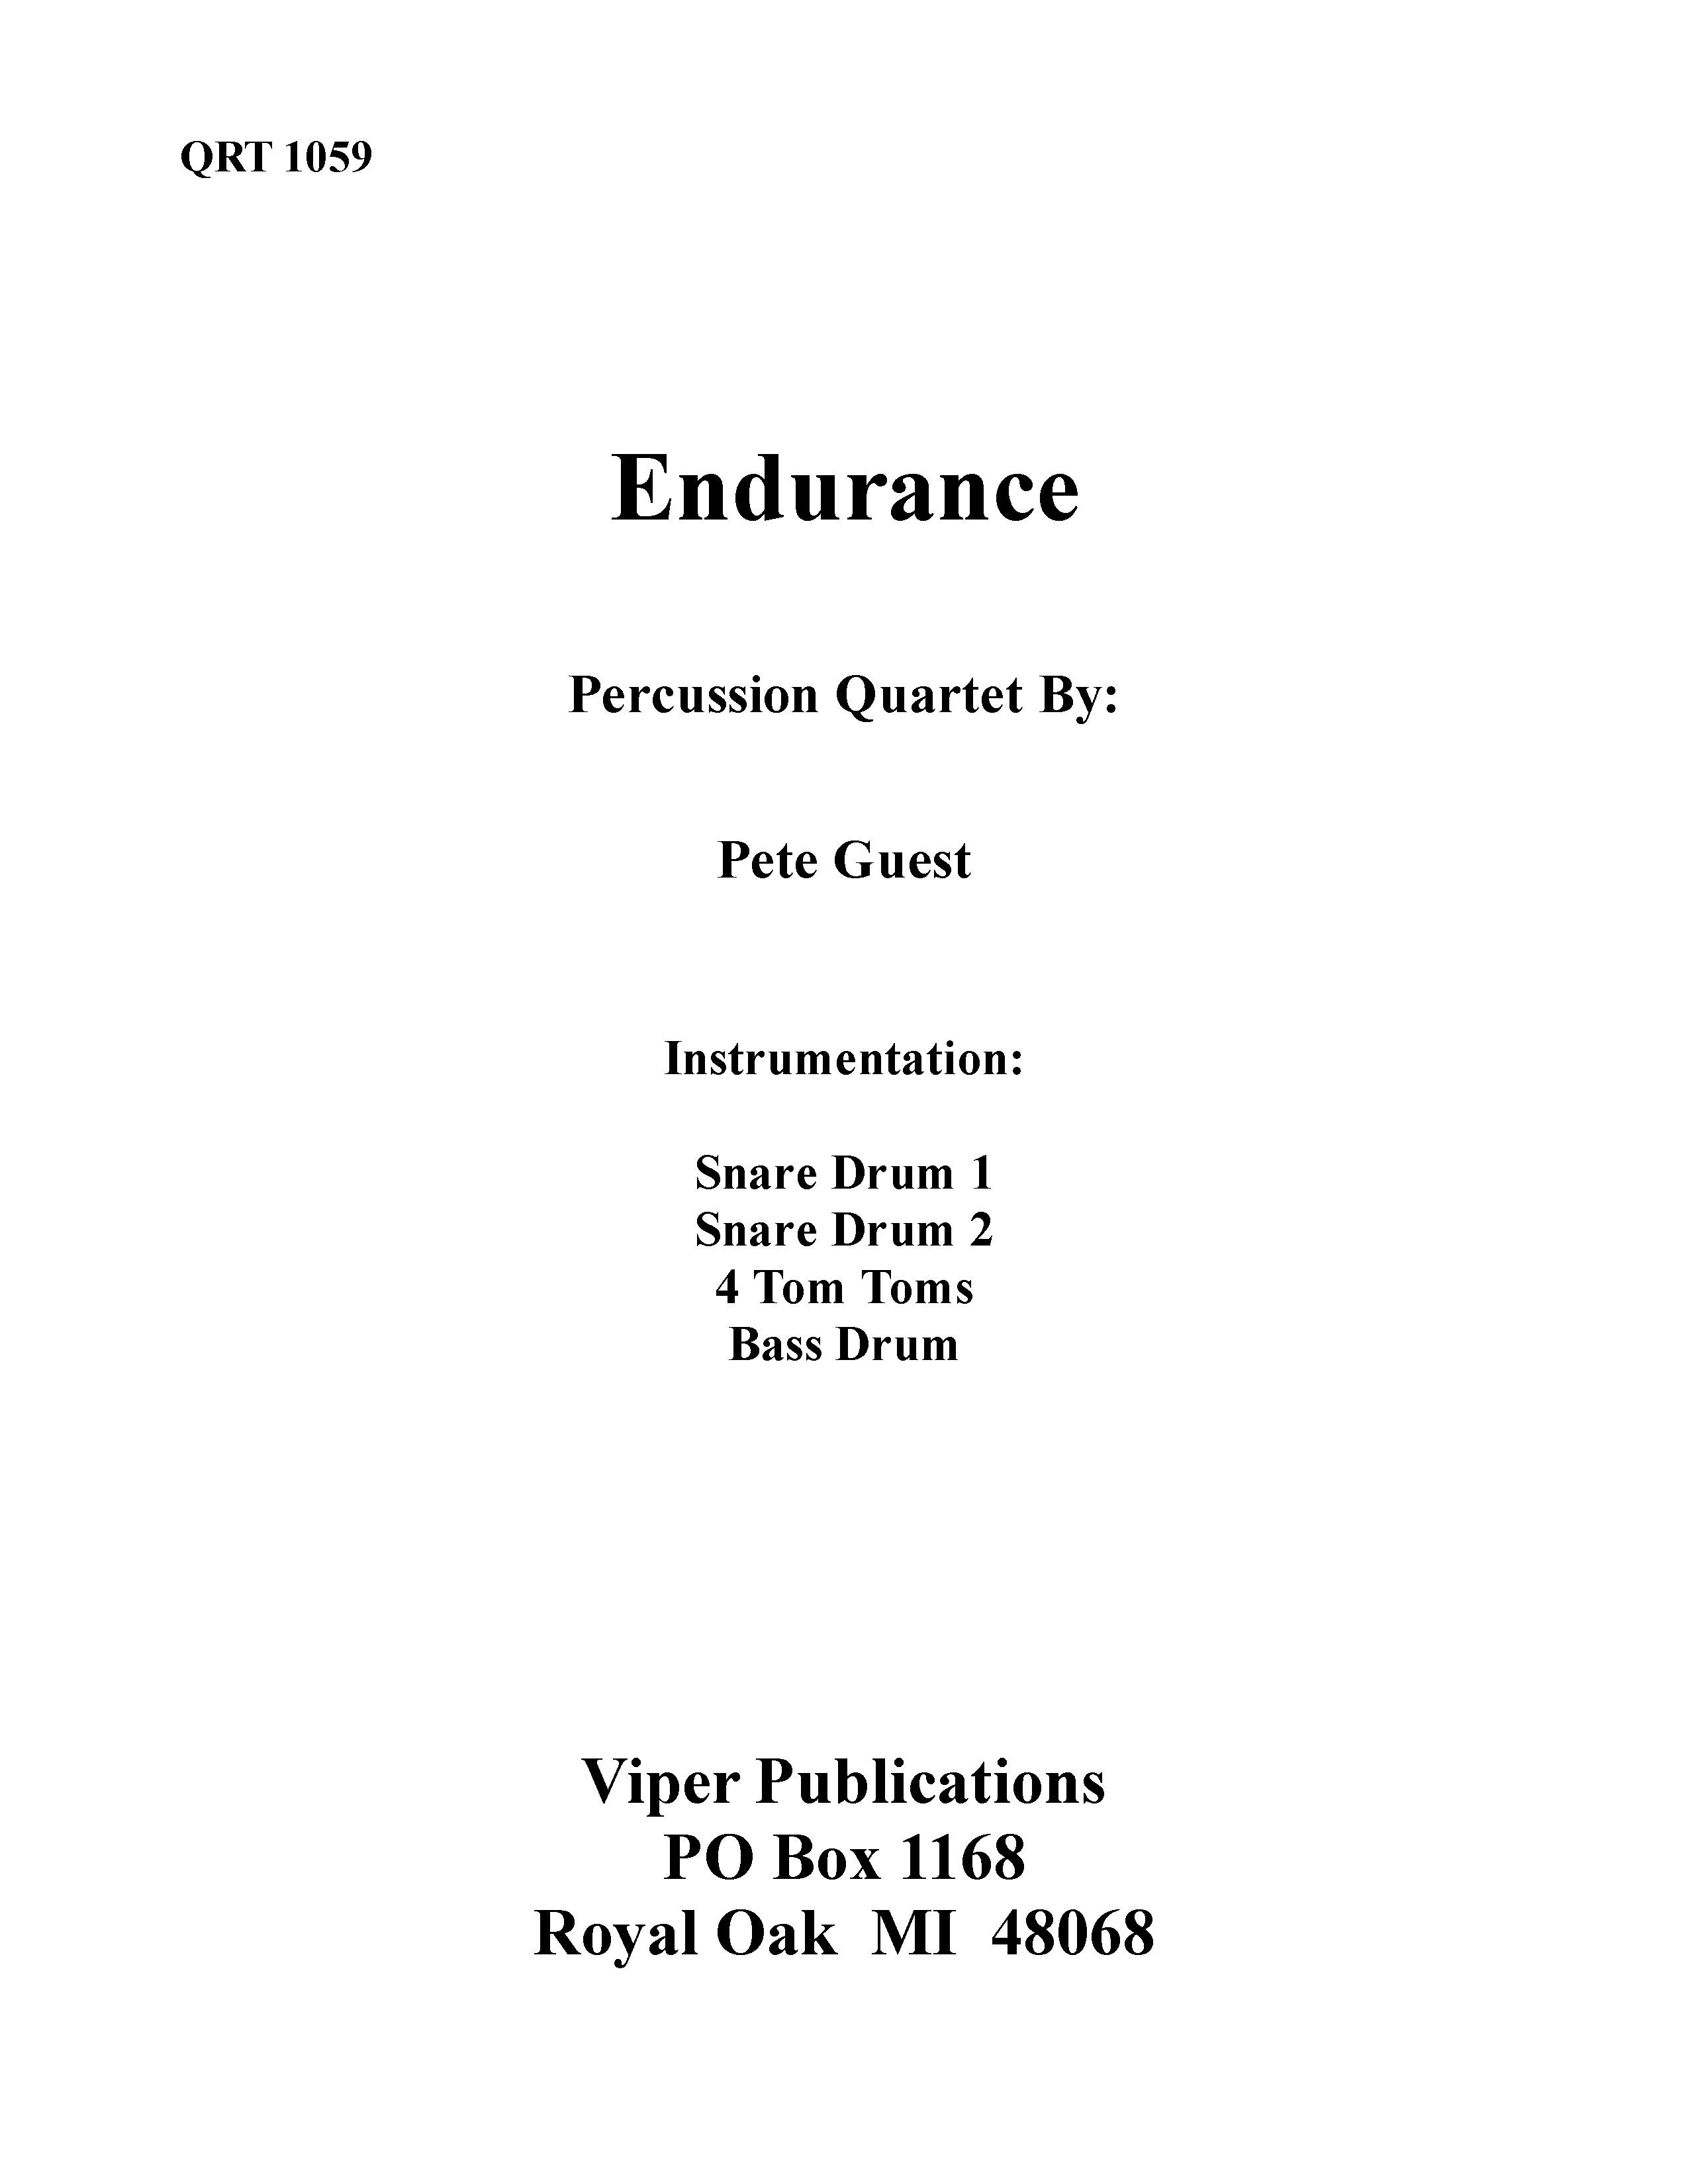 Endurance Thumbnail